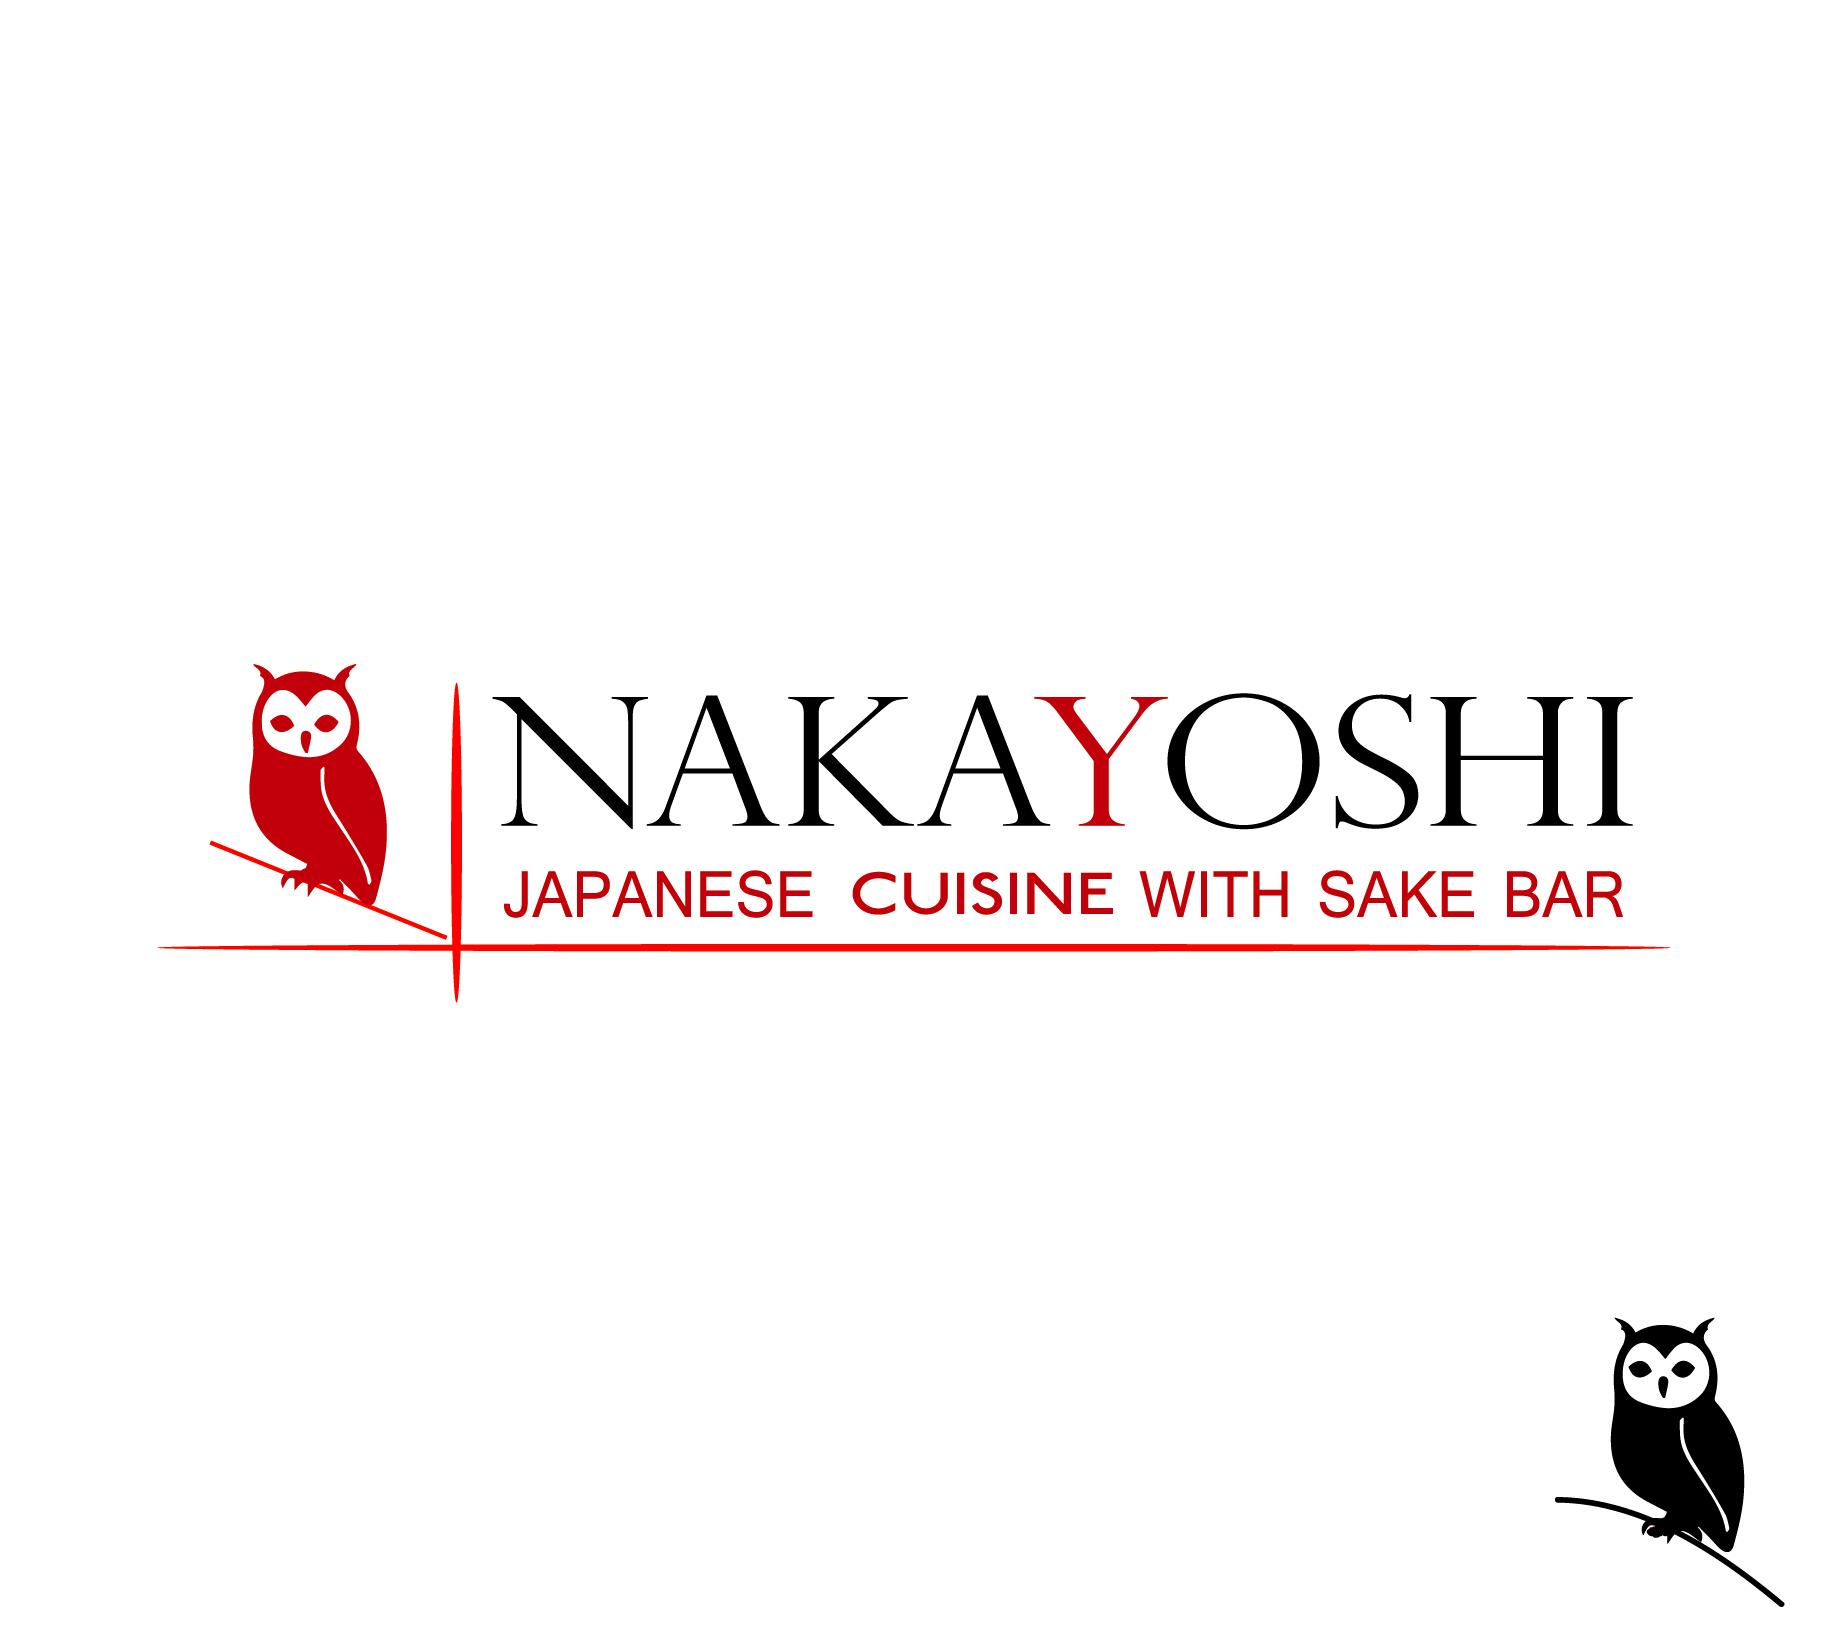 Logo Design by Maninder pal Singh - Entry No. 41 in the Logo Design Contest Imaginative Logo Design for NAKAYOSHI.